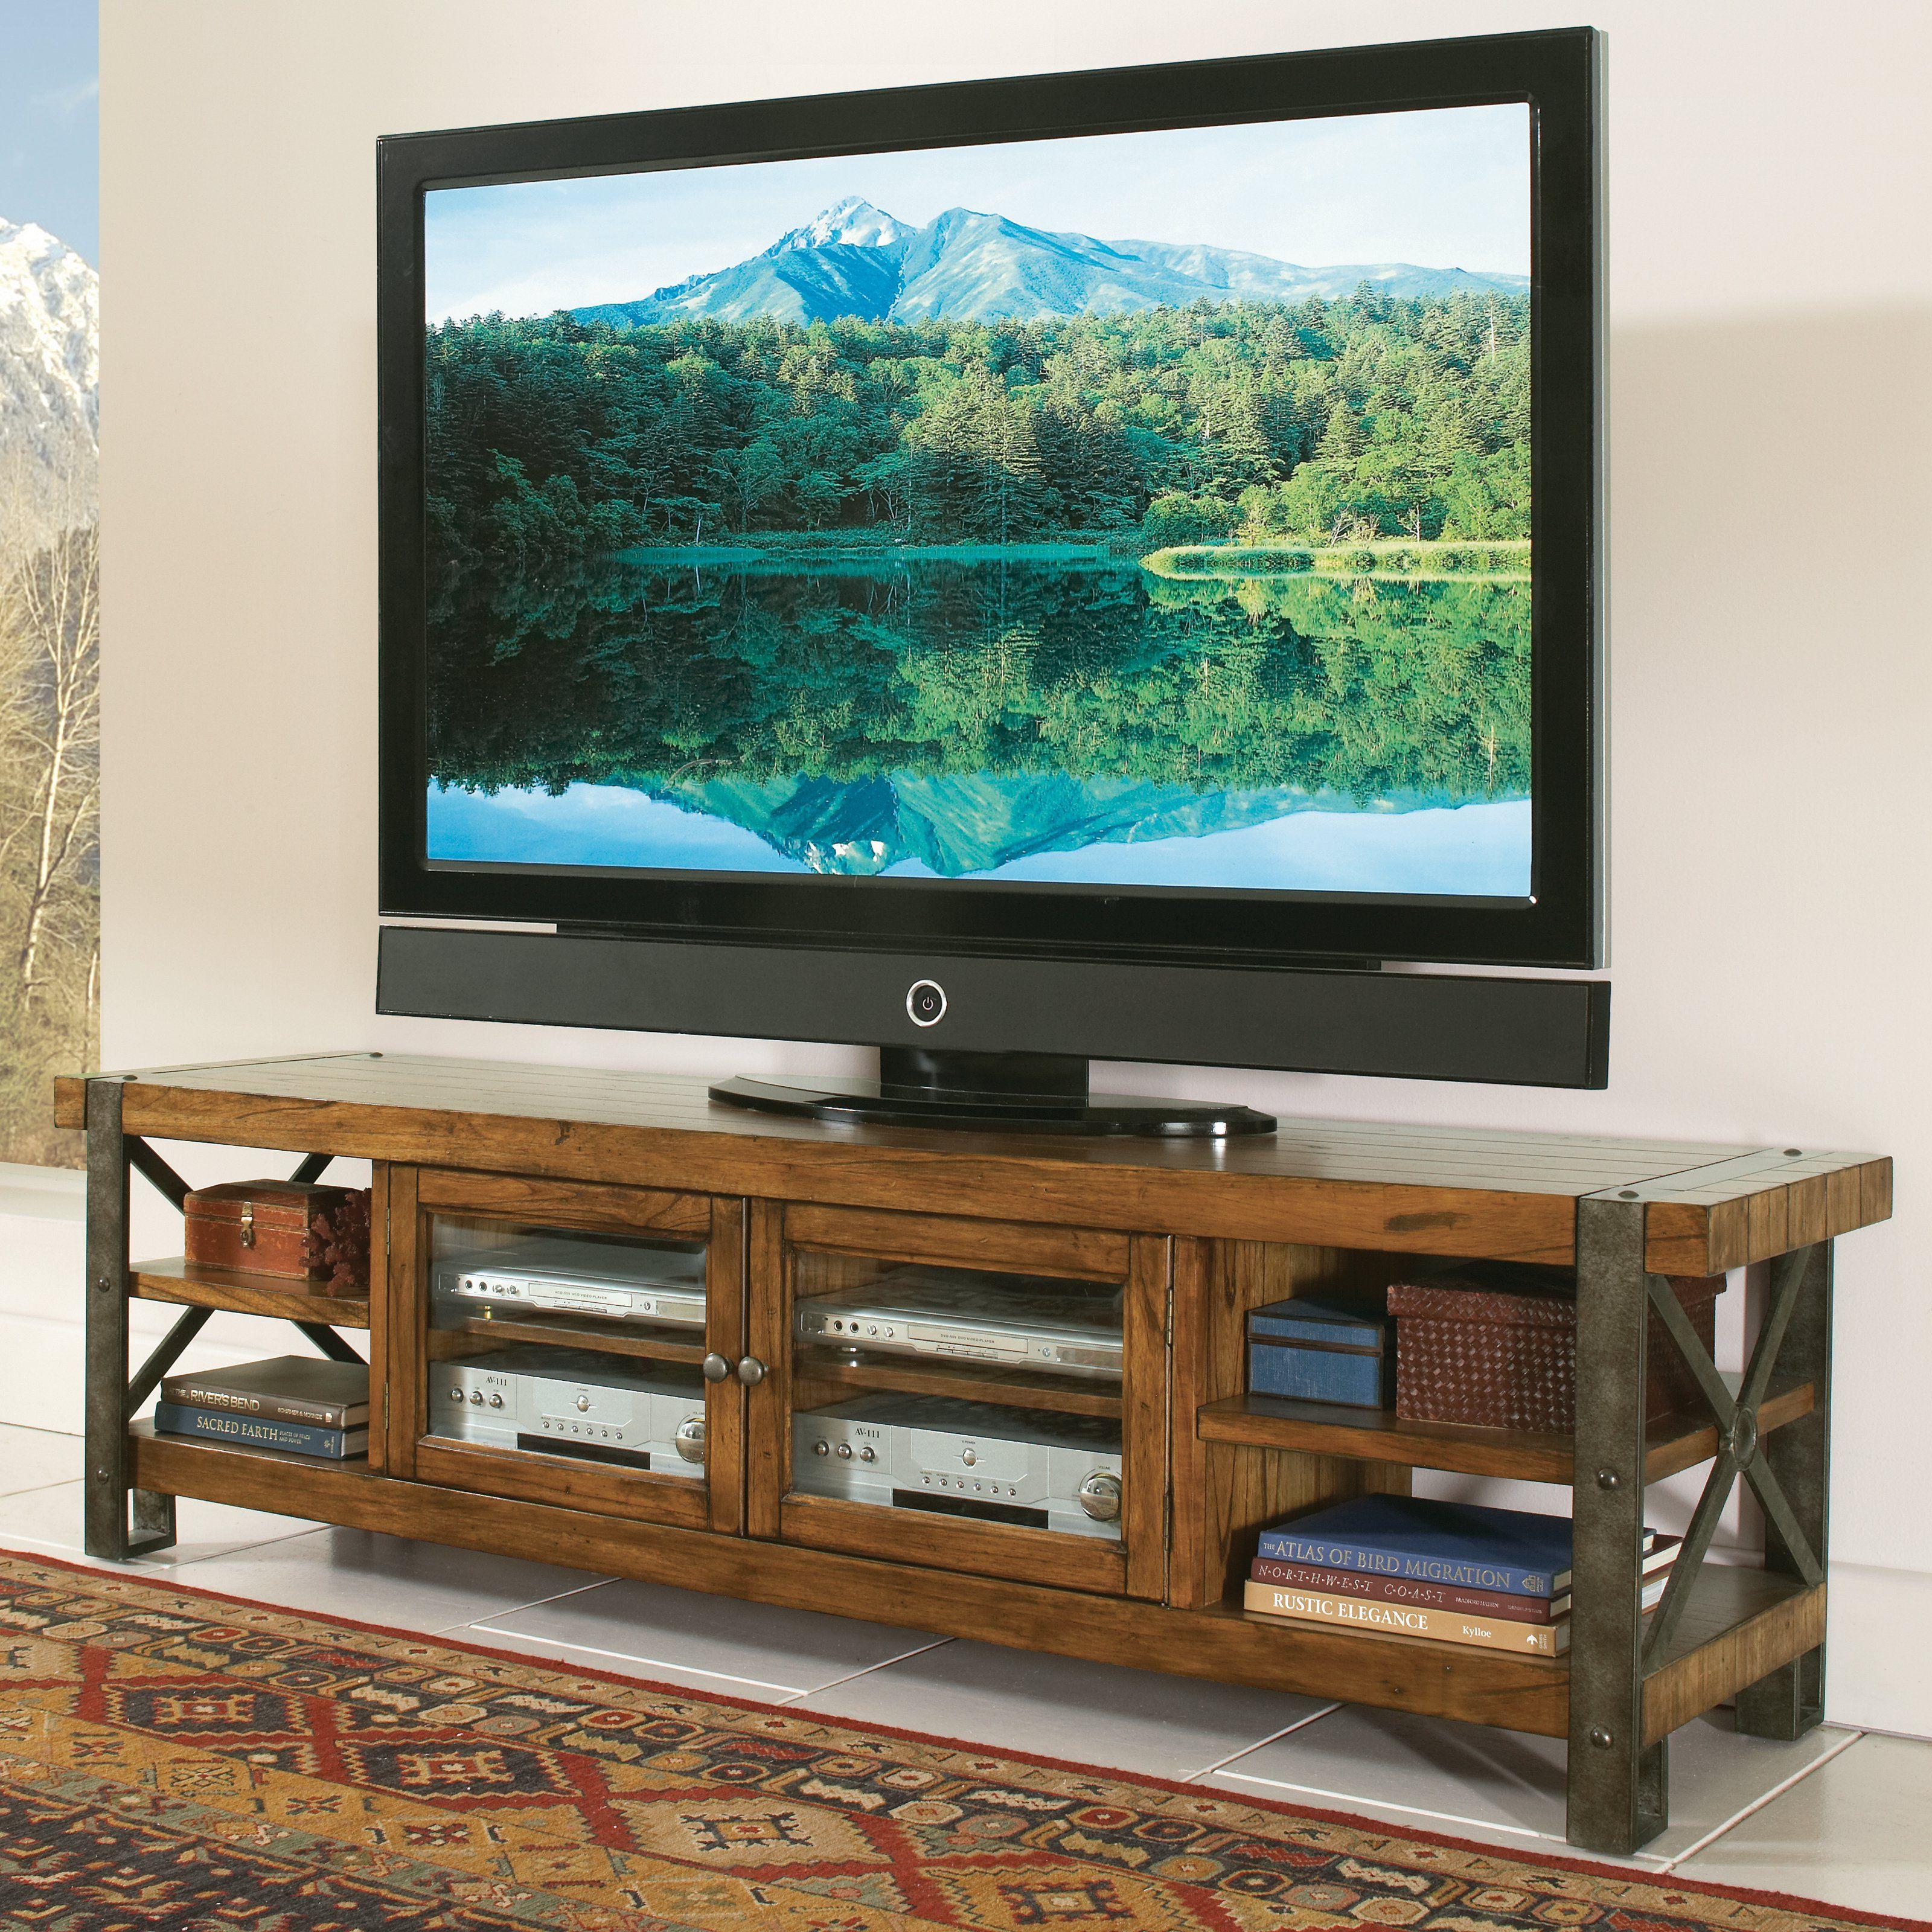 Dimensions 80w X 20d X 22h In Riverside Sierra 80 Tv Console 967 Entertainment Center Rustic Tv Stand Riverside Furniture